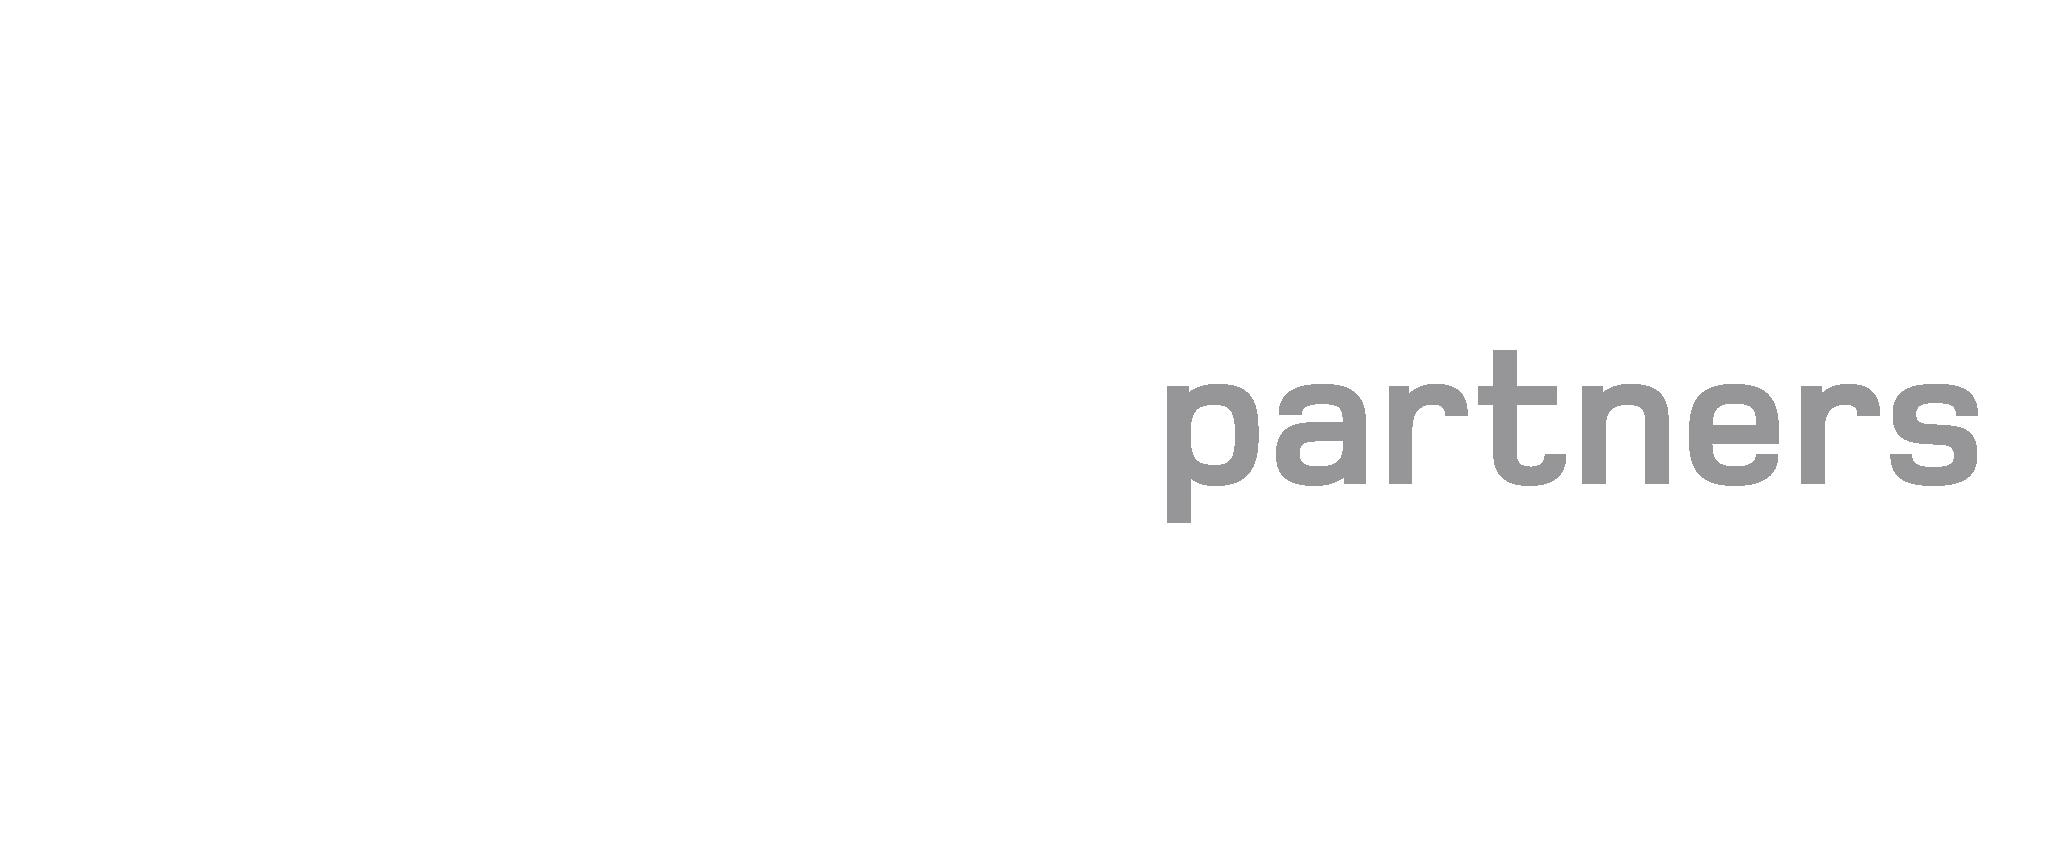 http://byronwritersfestival.com/wp-content/uploads/2016/04/Greenstone_website_logo.png